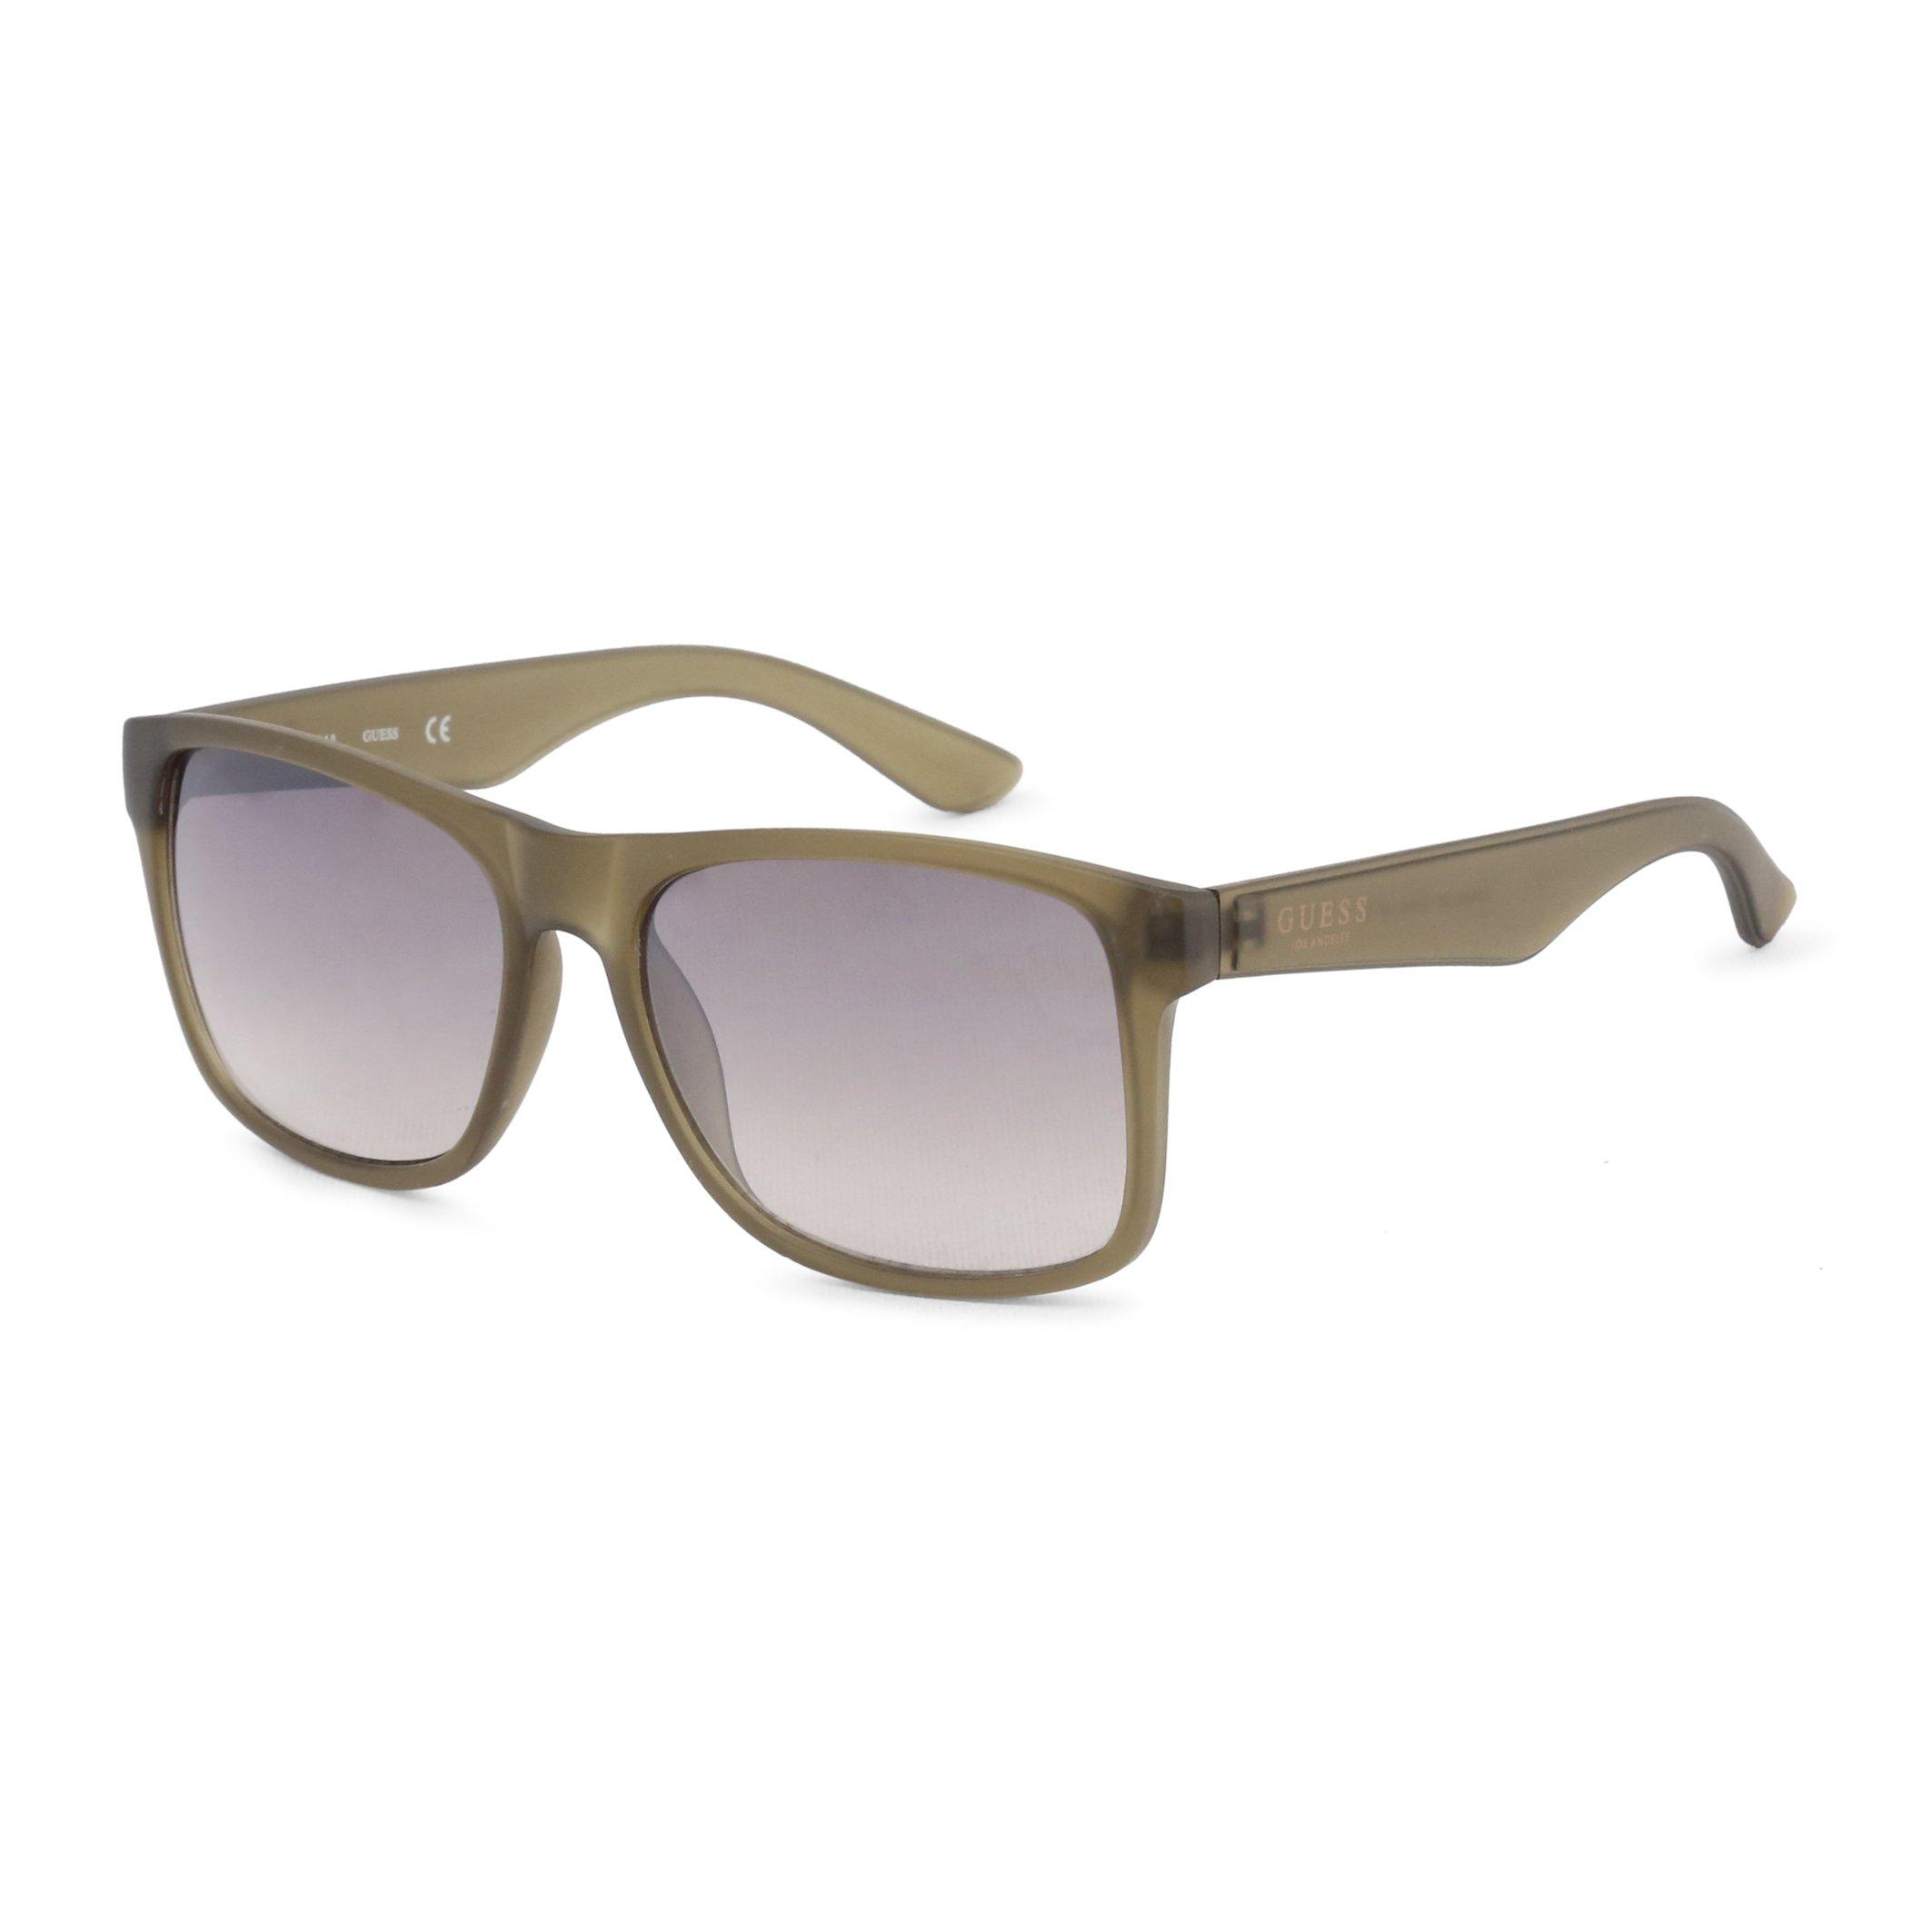 Guess Unisex Sunglasses Various Colours GF0203 - green NOSIZE